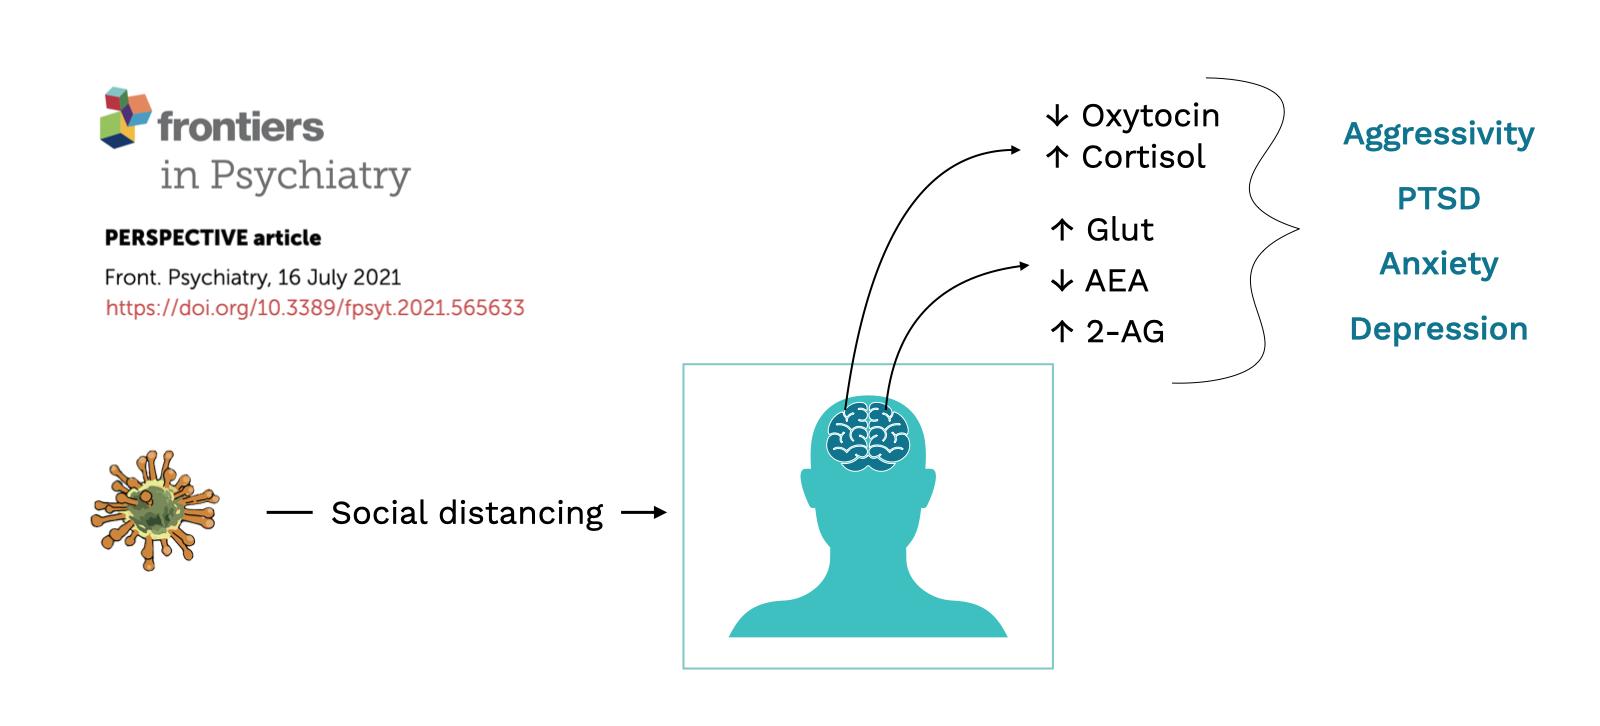 Omeostasi resilienza Sistema Endocannabinoide e covid-19 - Paper Image Viola Brugnatelli - Cannabiscienza